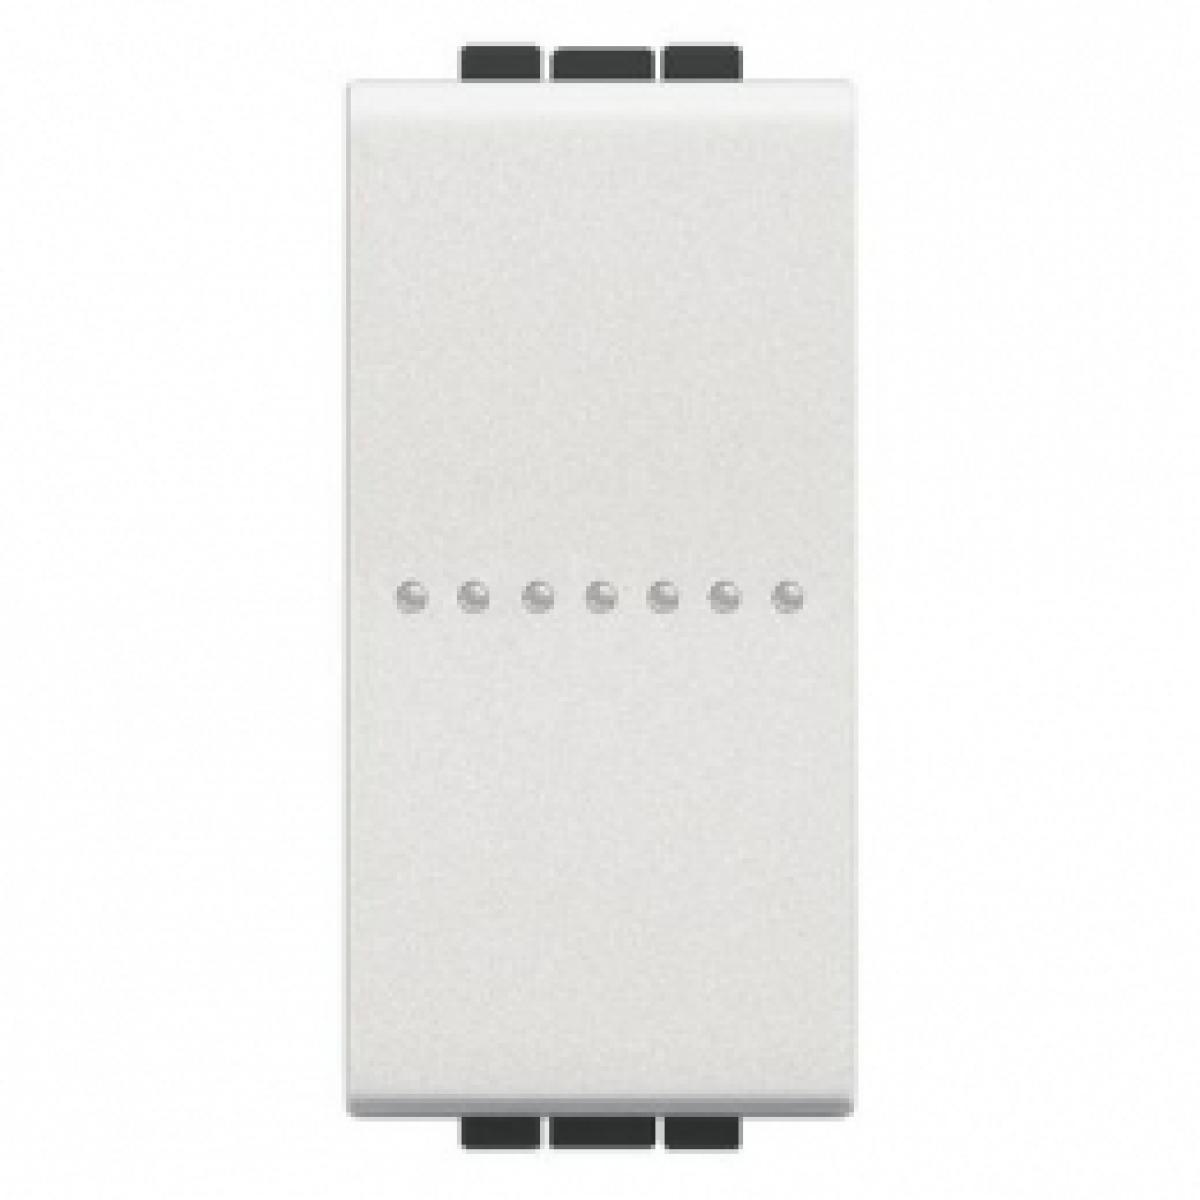 Deviatore Assiale Bticino Living Light N4053N